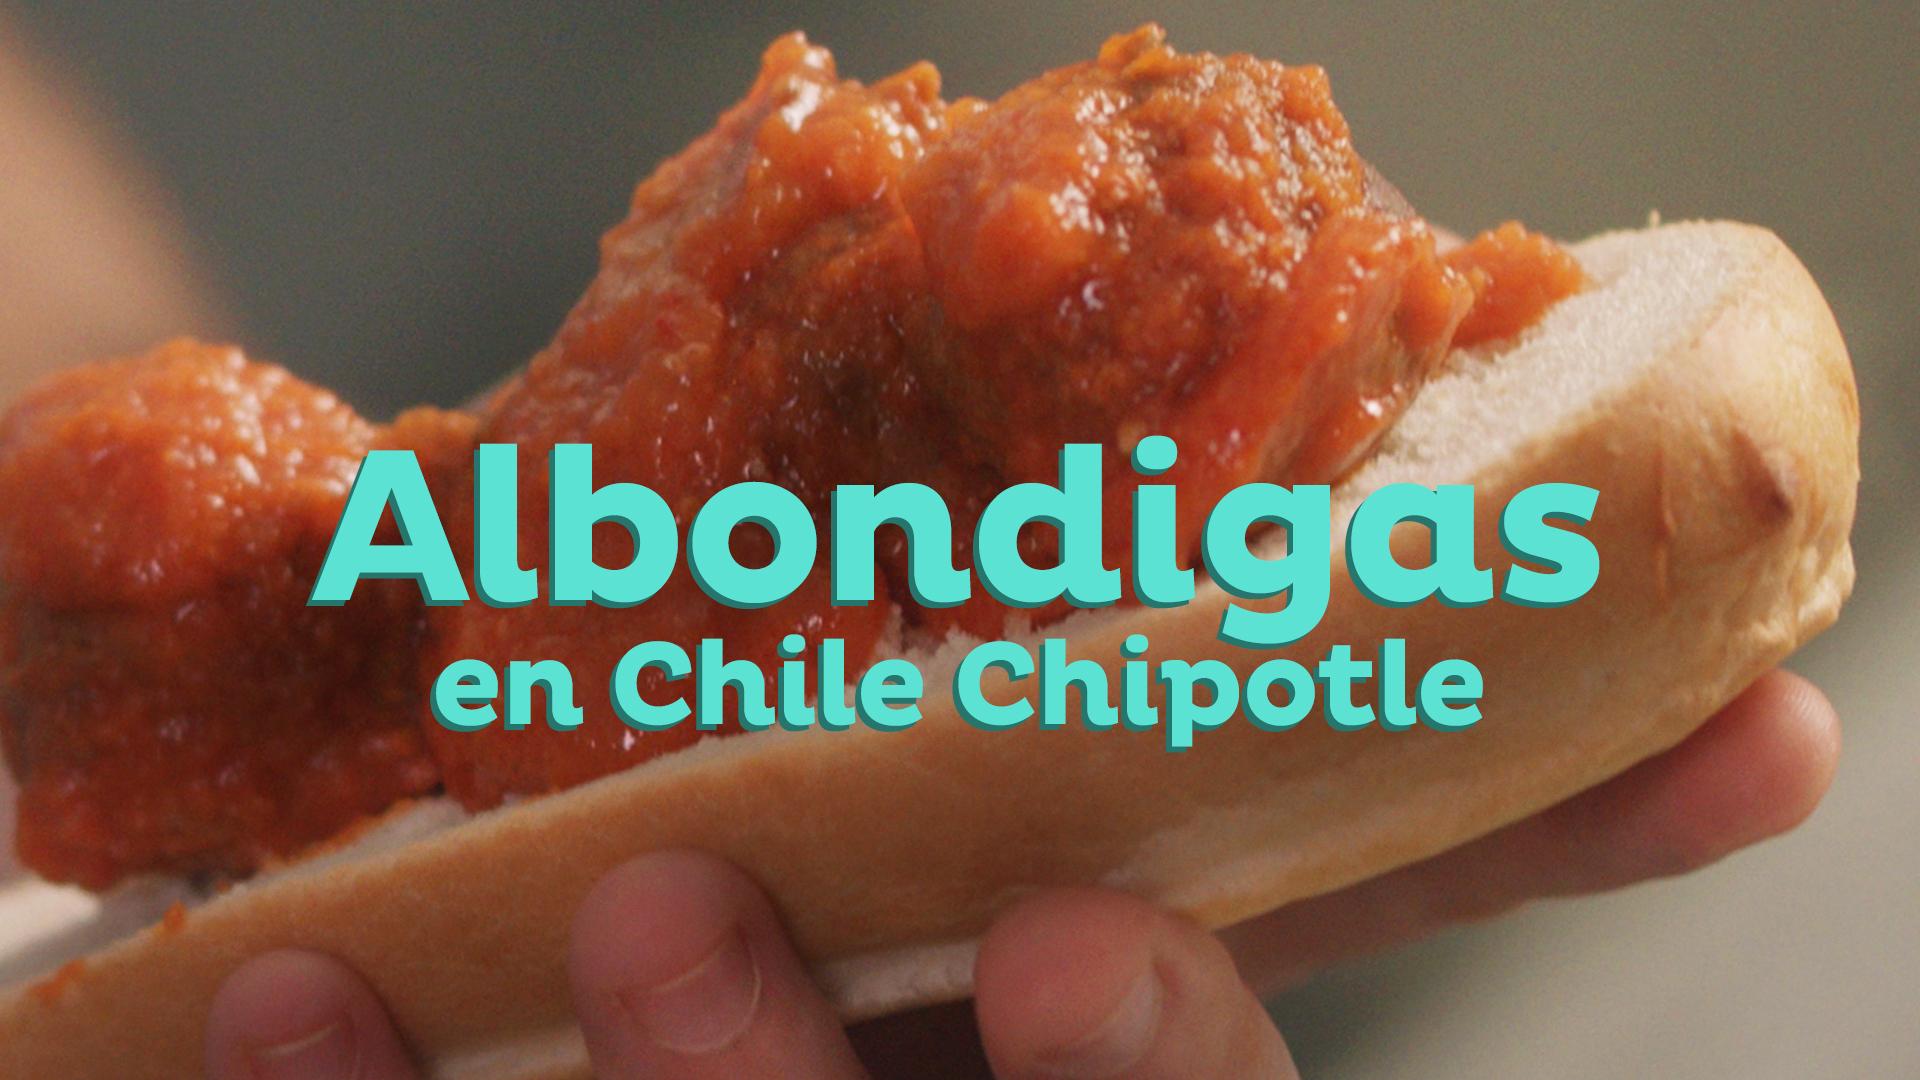 Legacy | Albondigas en Chile Chipotle